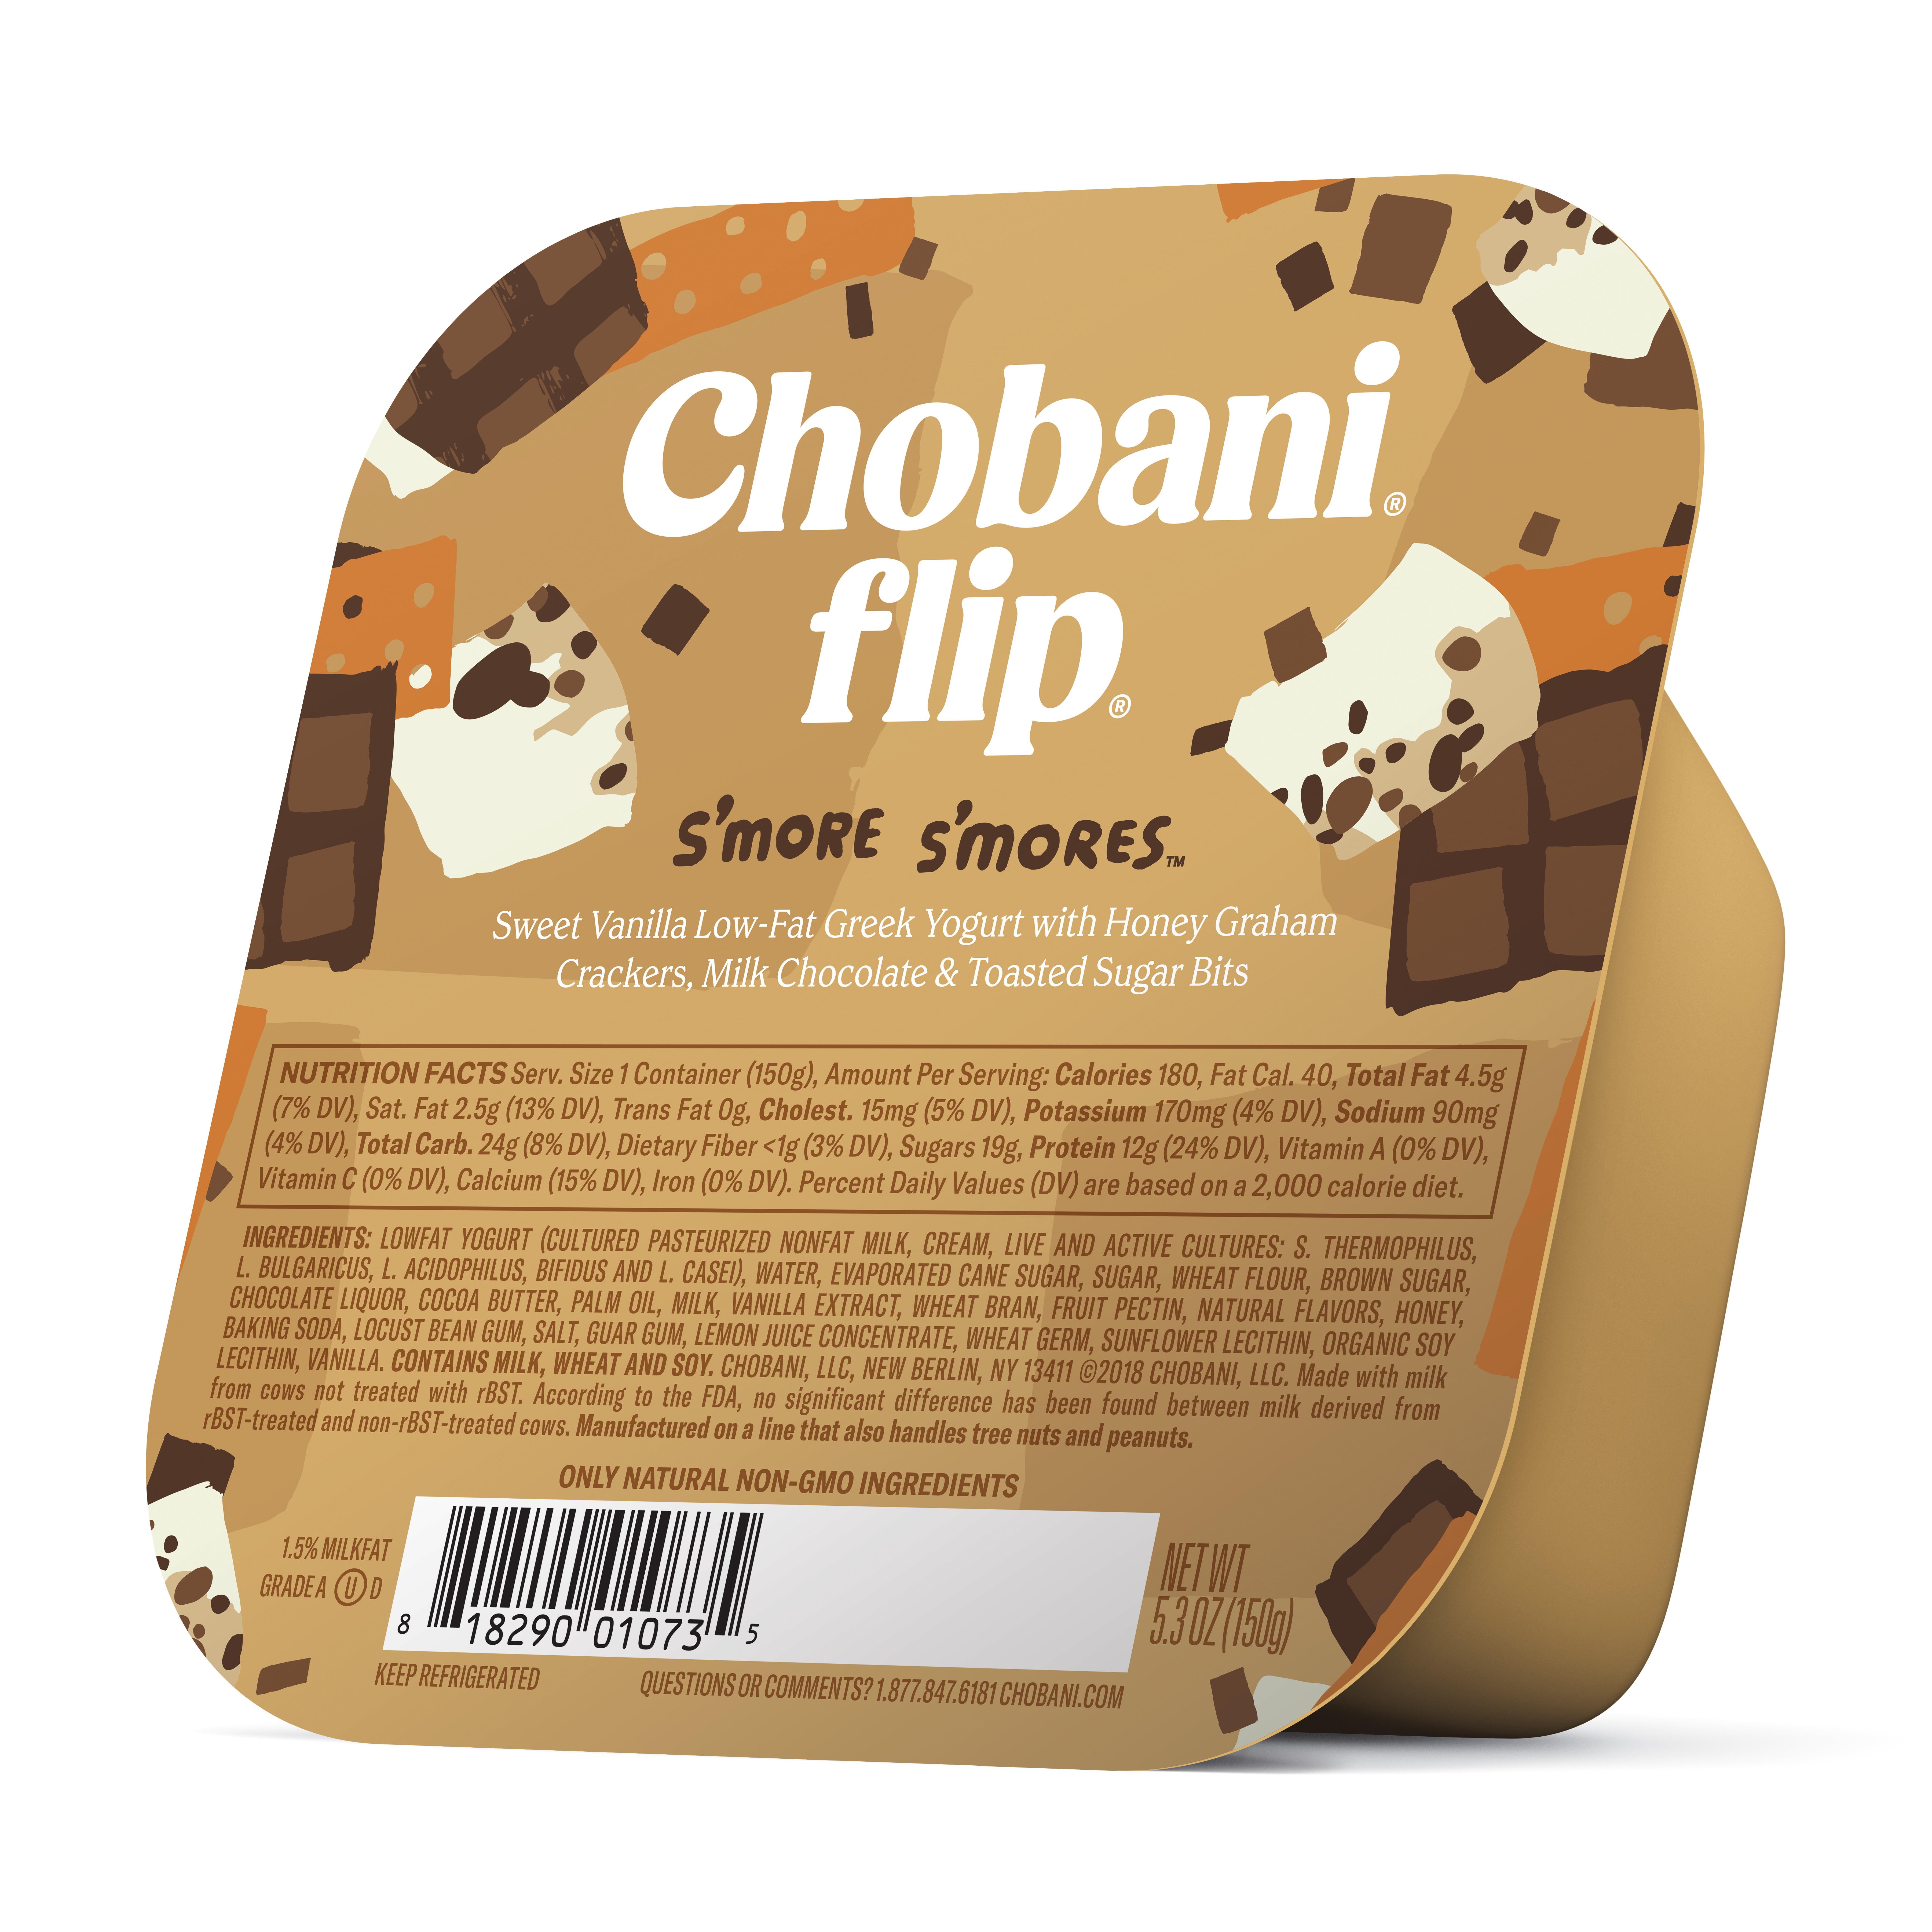 Chobani, Flip S'more S'mores Greek Yogurt, 5.3 Oz.